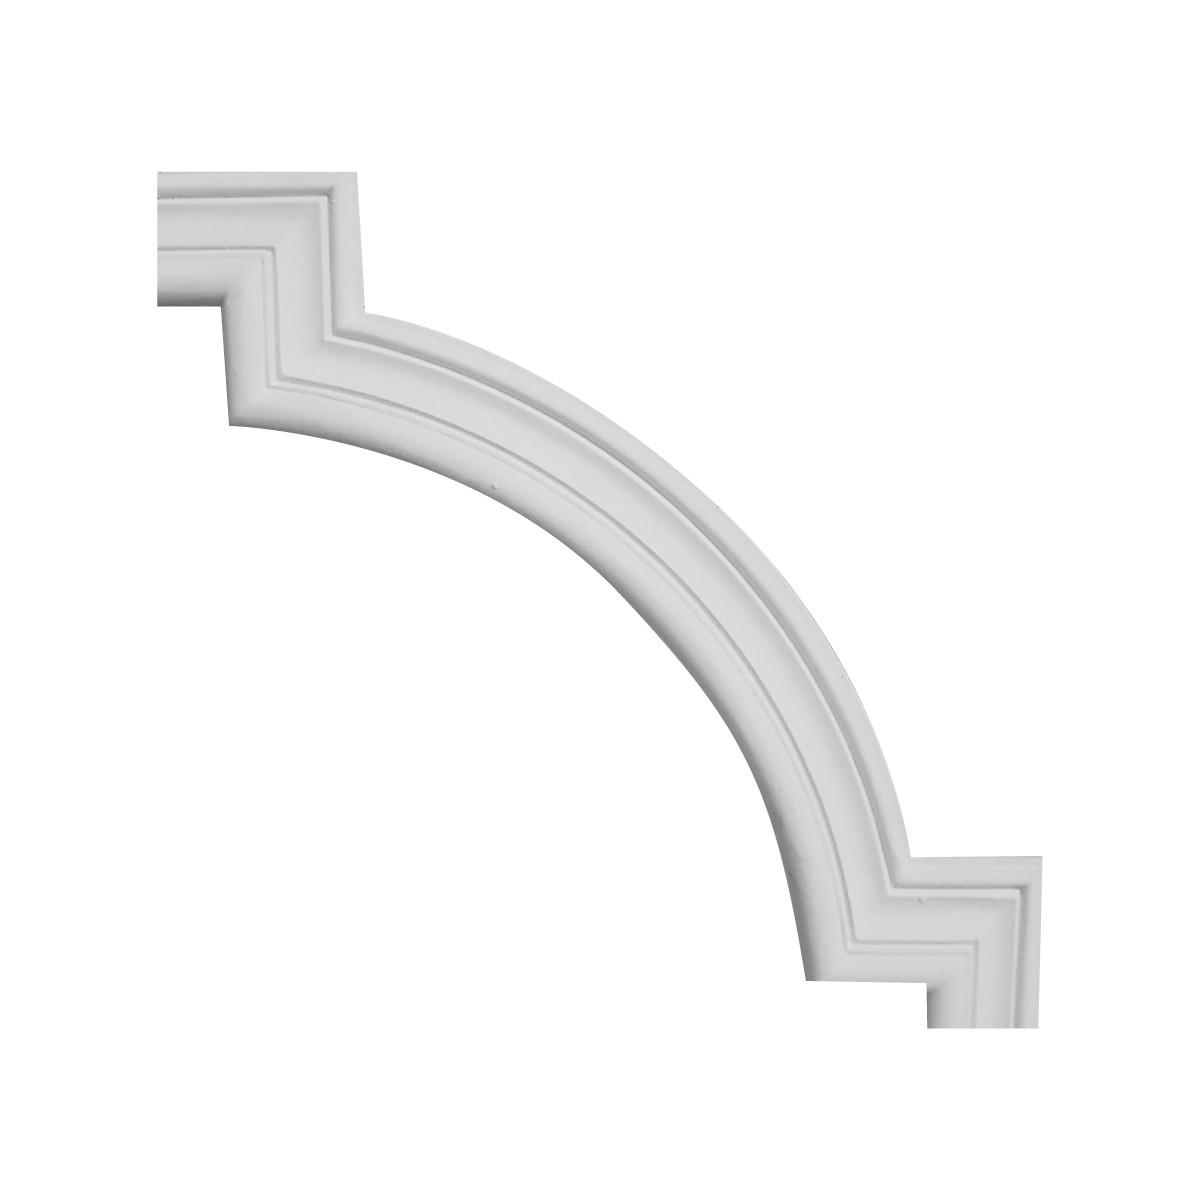 Гипсовая лепнина декоративный угол у-57 h180х180мм